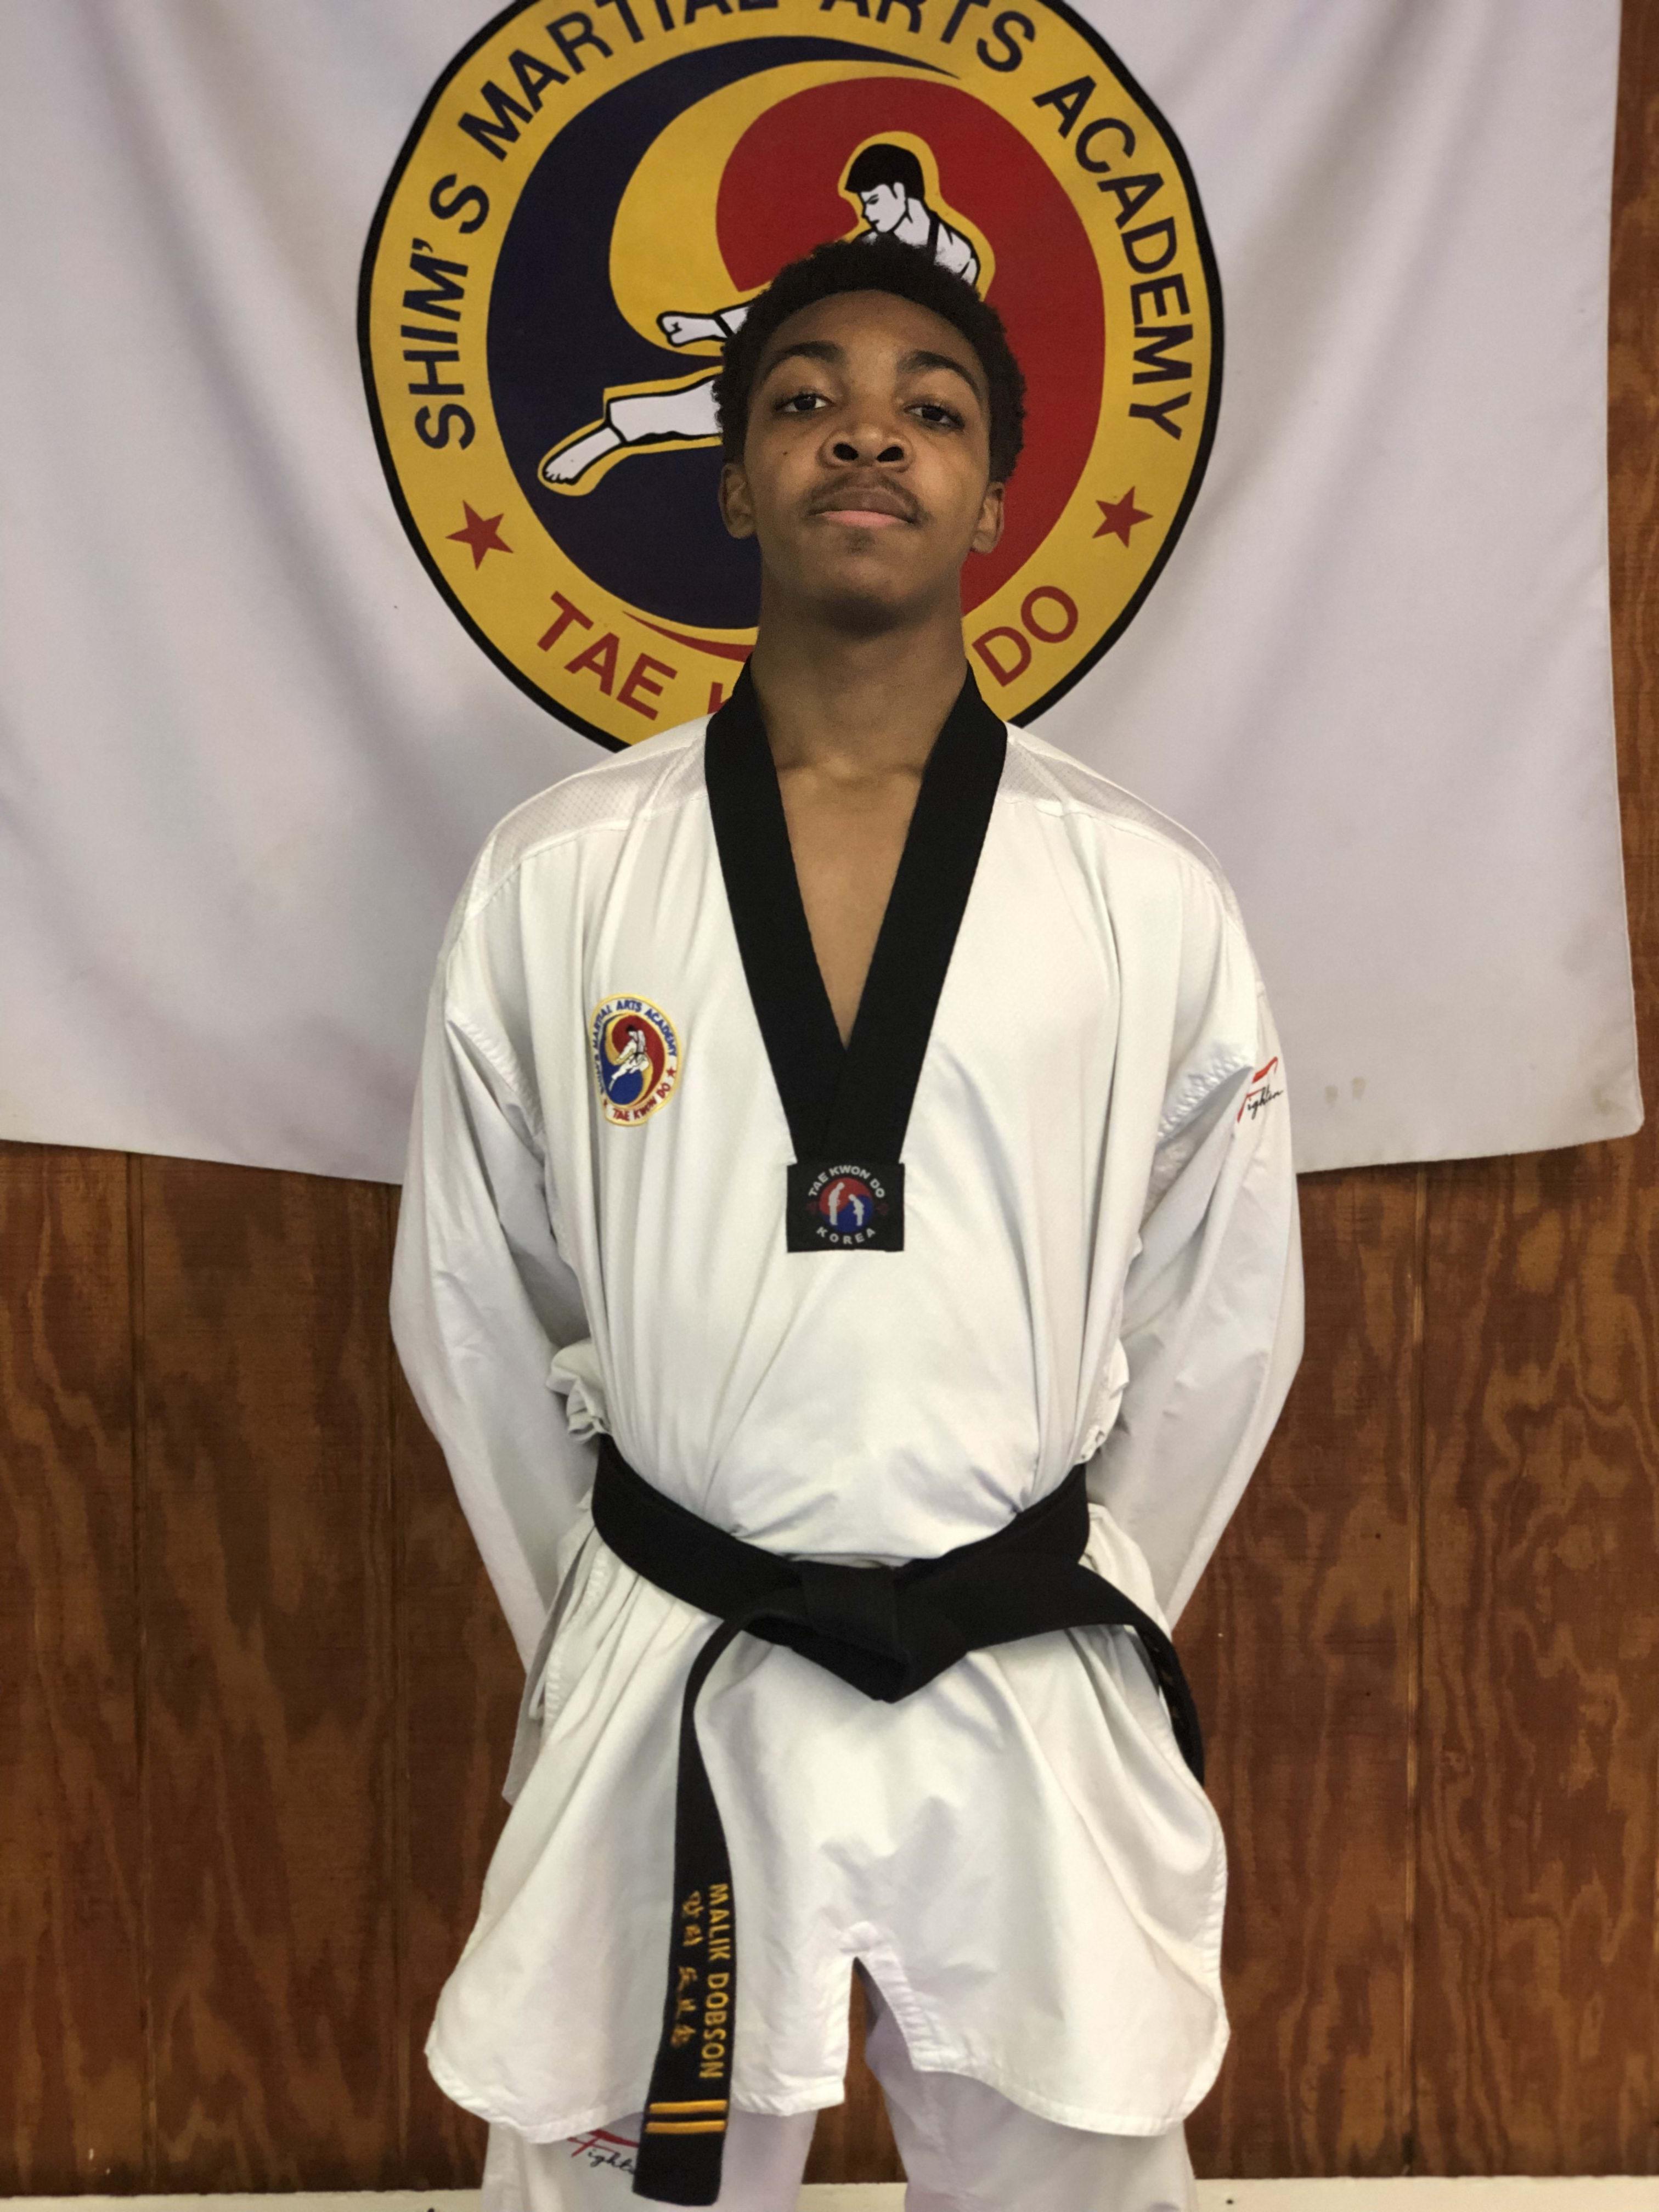 Malik Dobson in Elizabeth - Shim's Martial Arts Academy